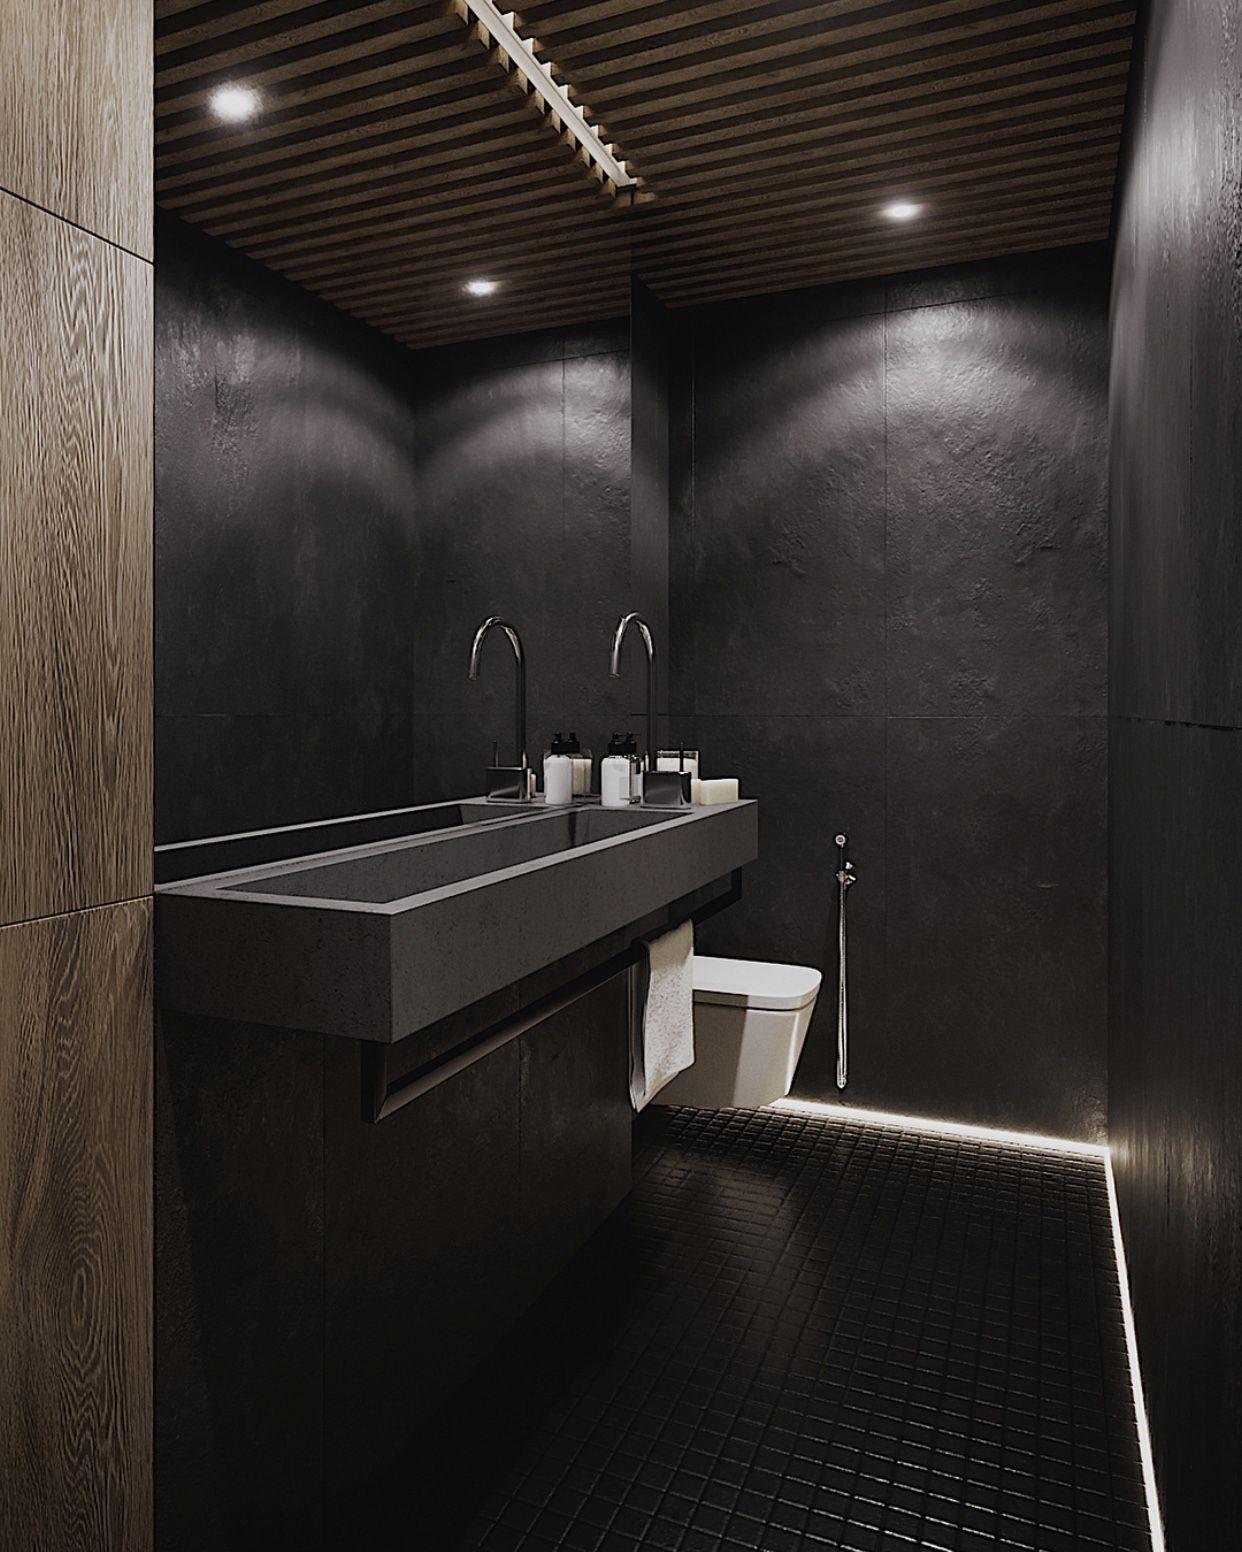 Cocoon Dark Bathroom Inspiration Stainless Steel Bathroom Taps Inox Faucets Lux Bathroom Design Luxury Minimalist Kitchen Minimalist Interior Living Room